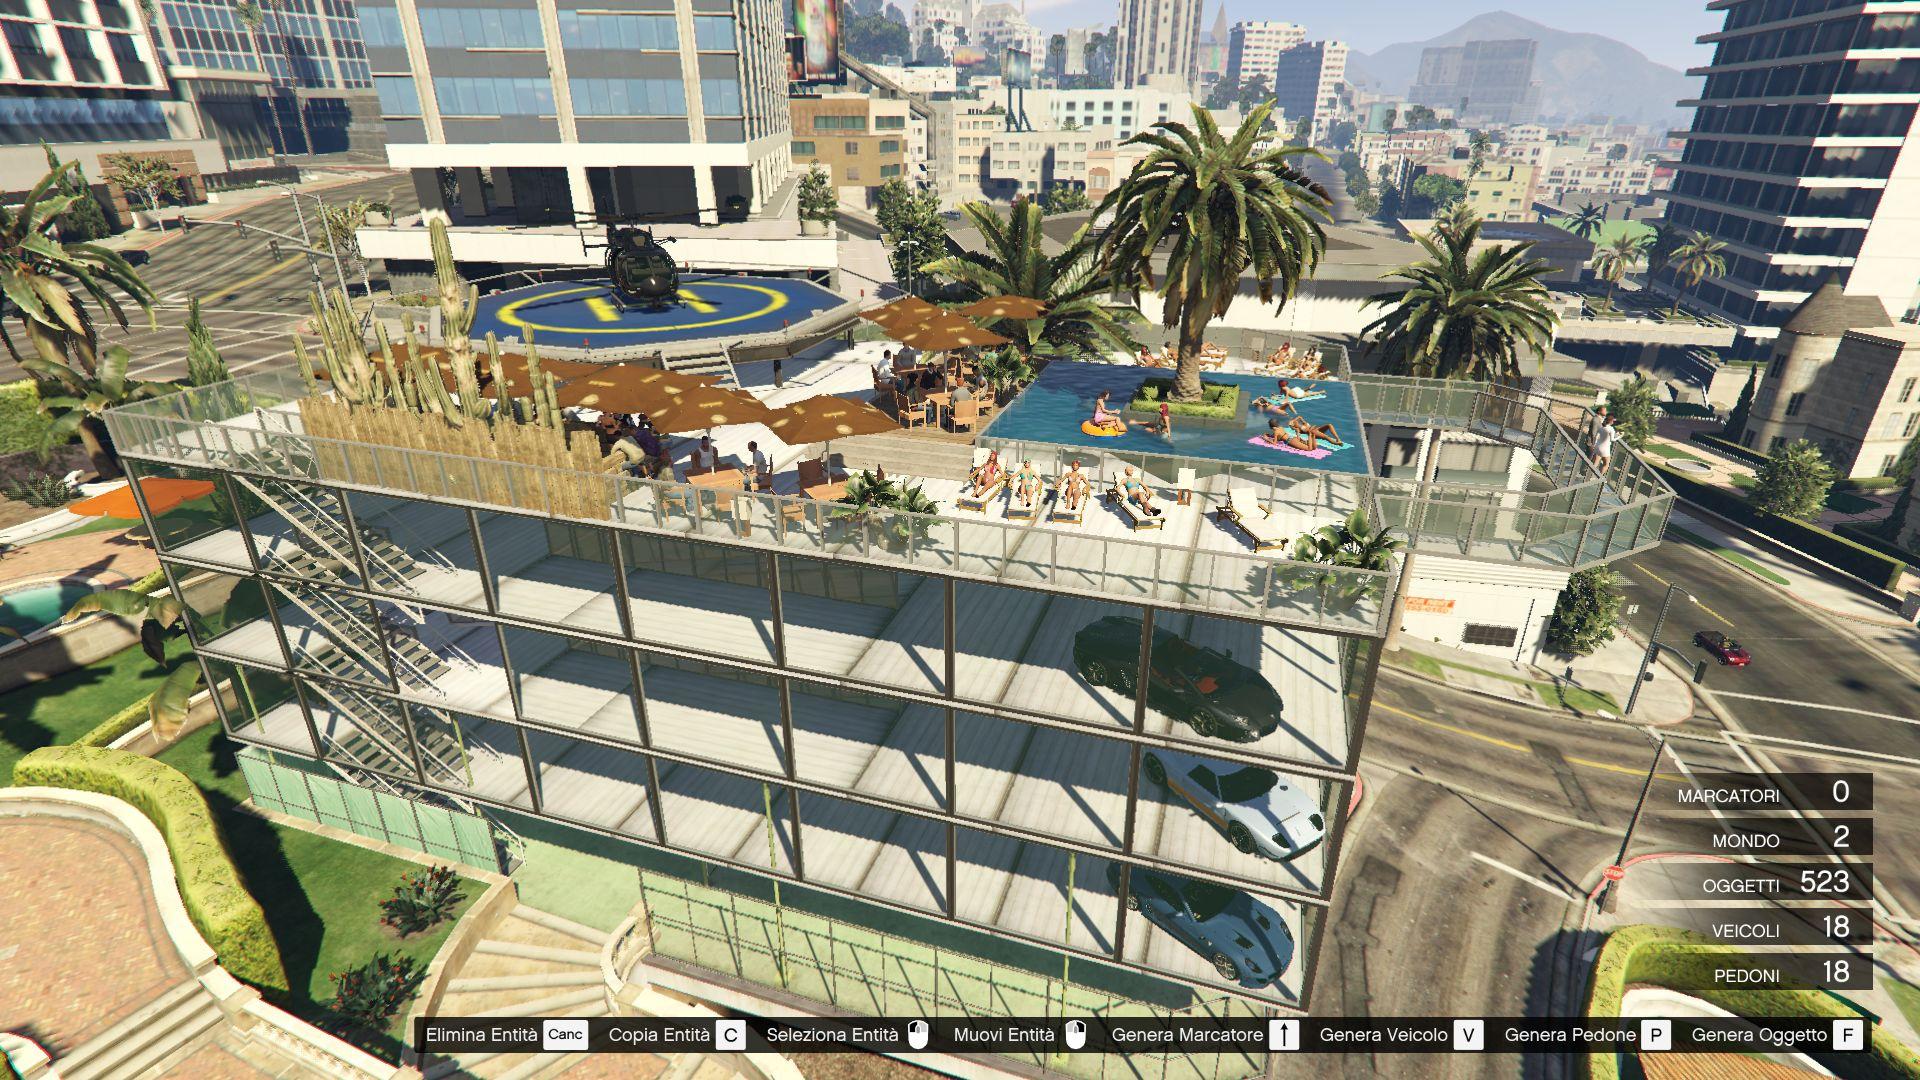 Michael's garage 3   party terrace [map editor / spg]   gta5 mods.com